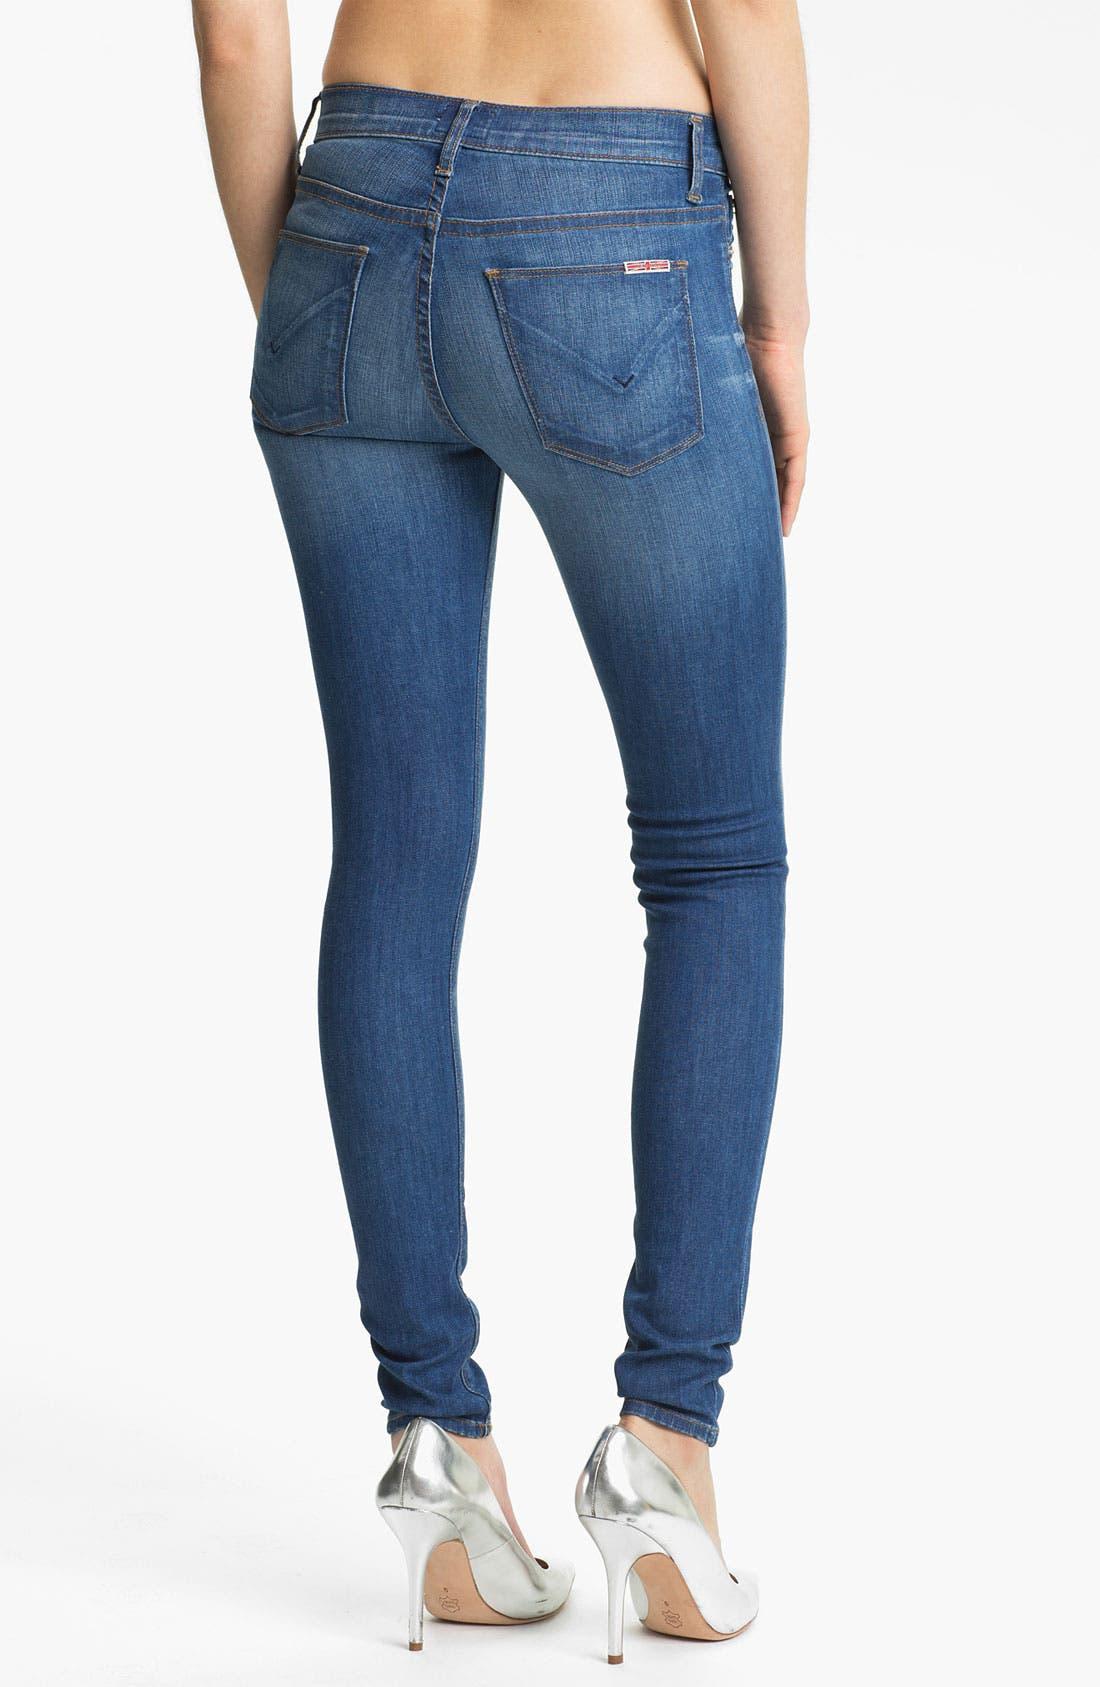 Alternate Image 2  - Hudson Jeans 'Nico' Skinny Stretch Jeans (Morrissey)